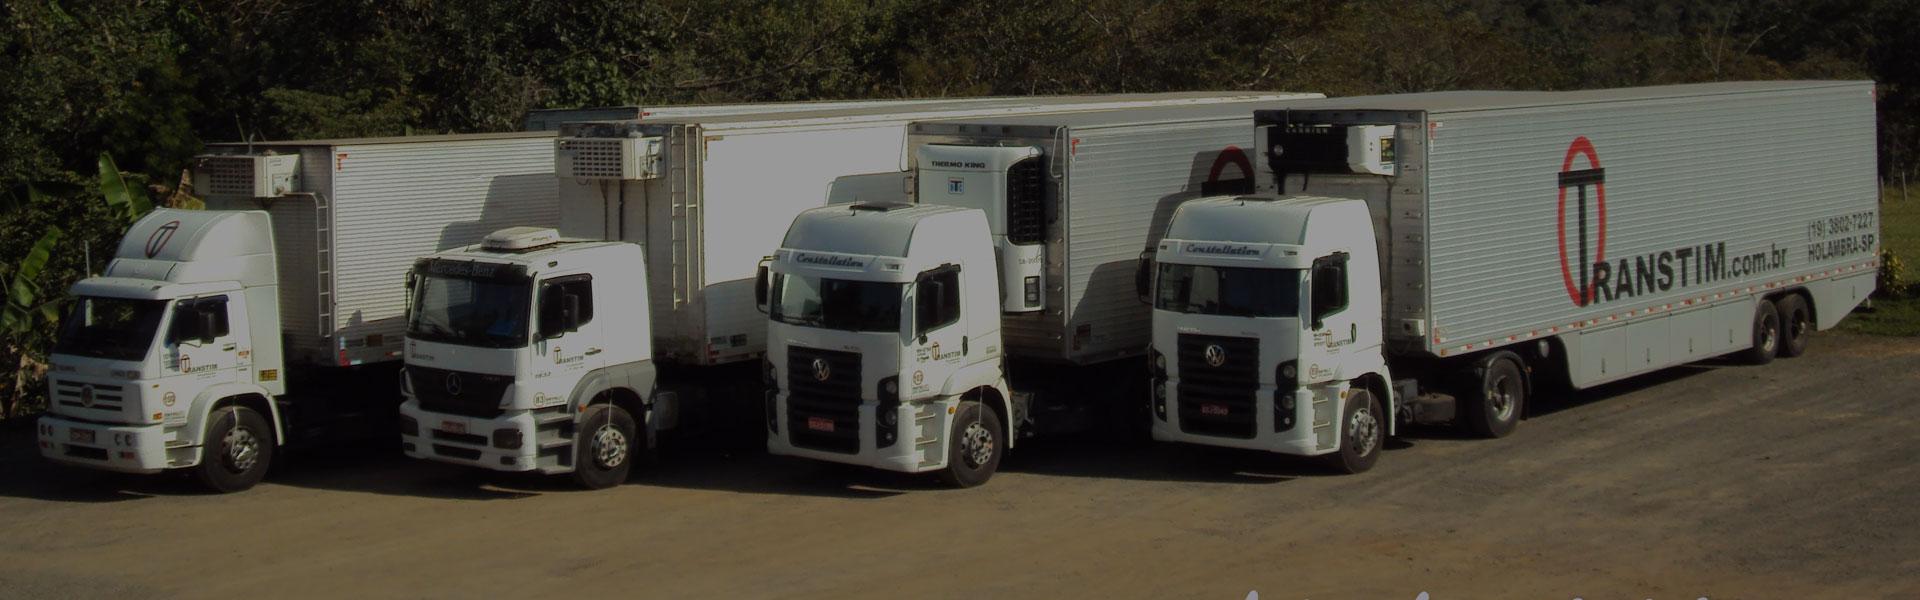 transtim-transportadora-caminhoes-3